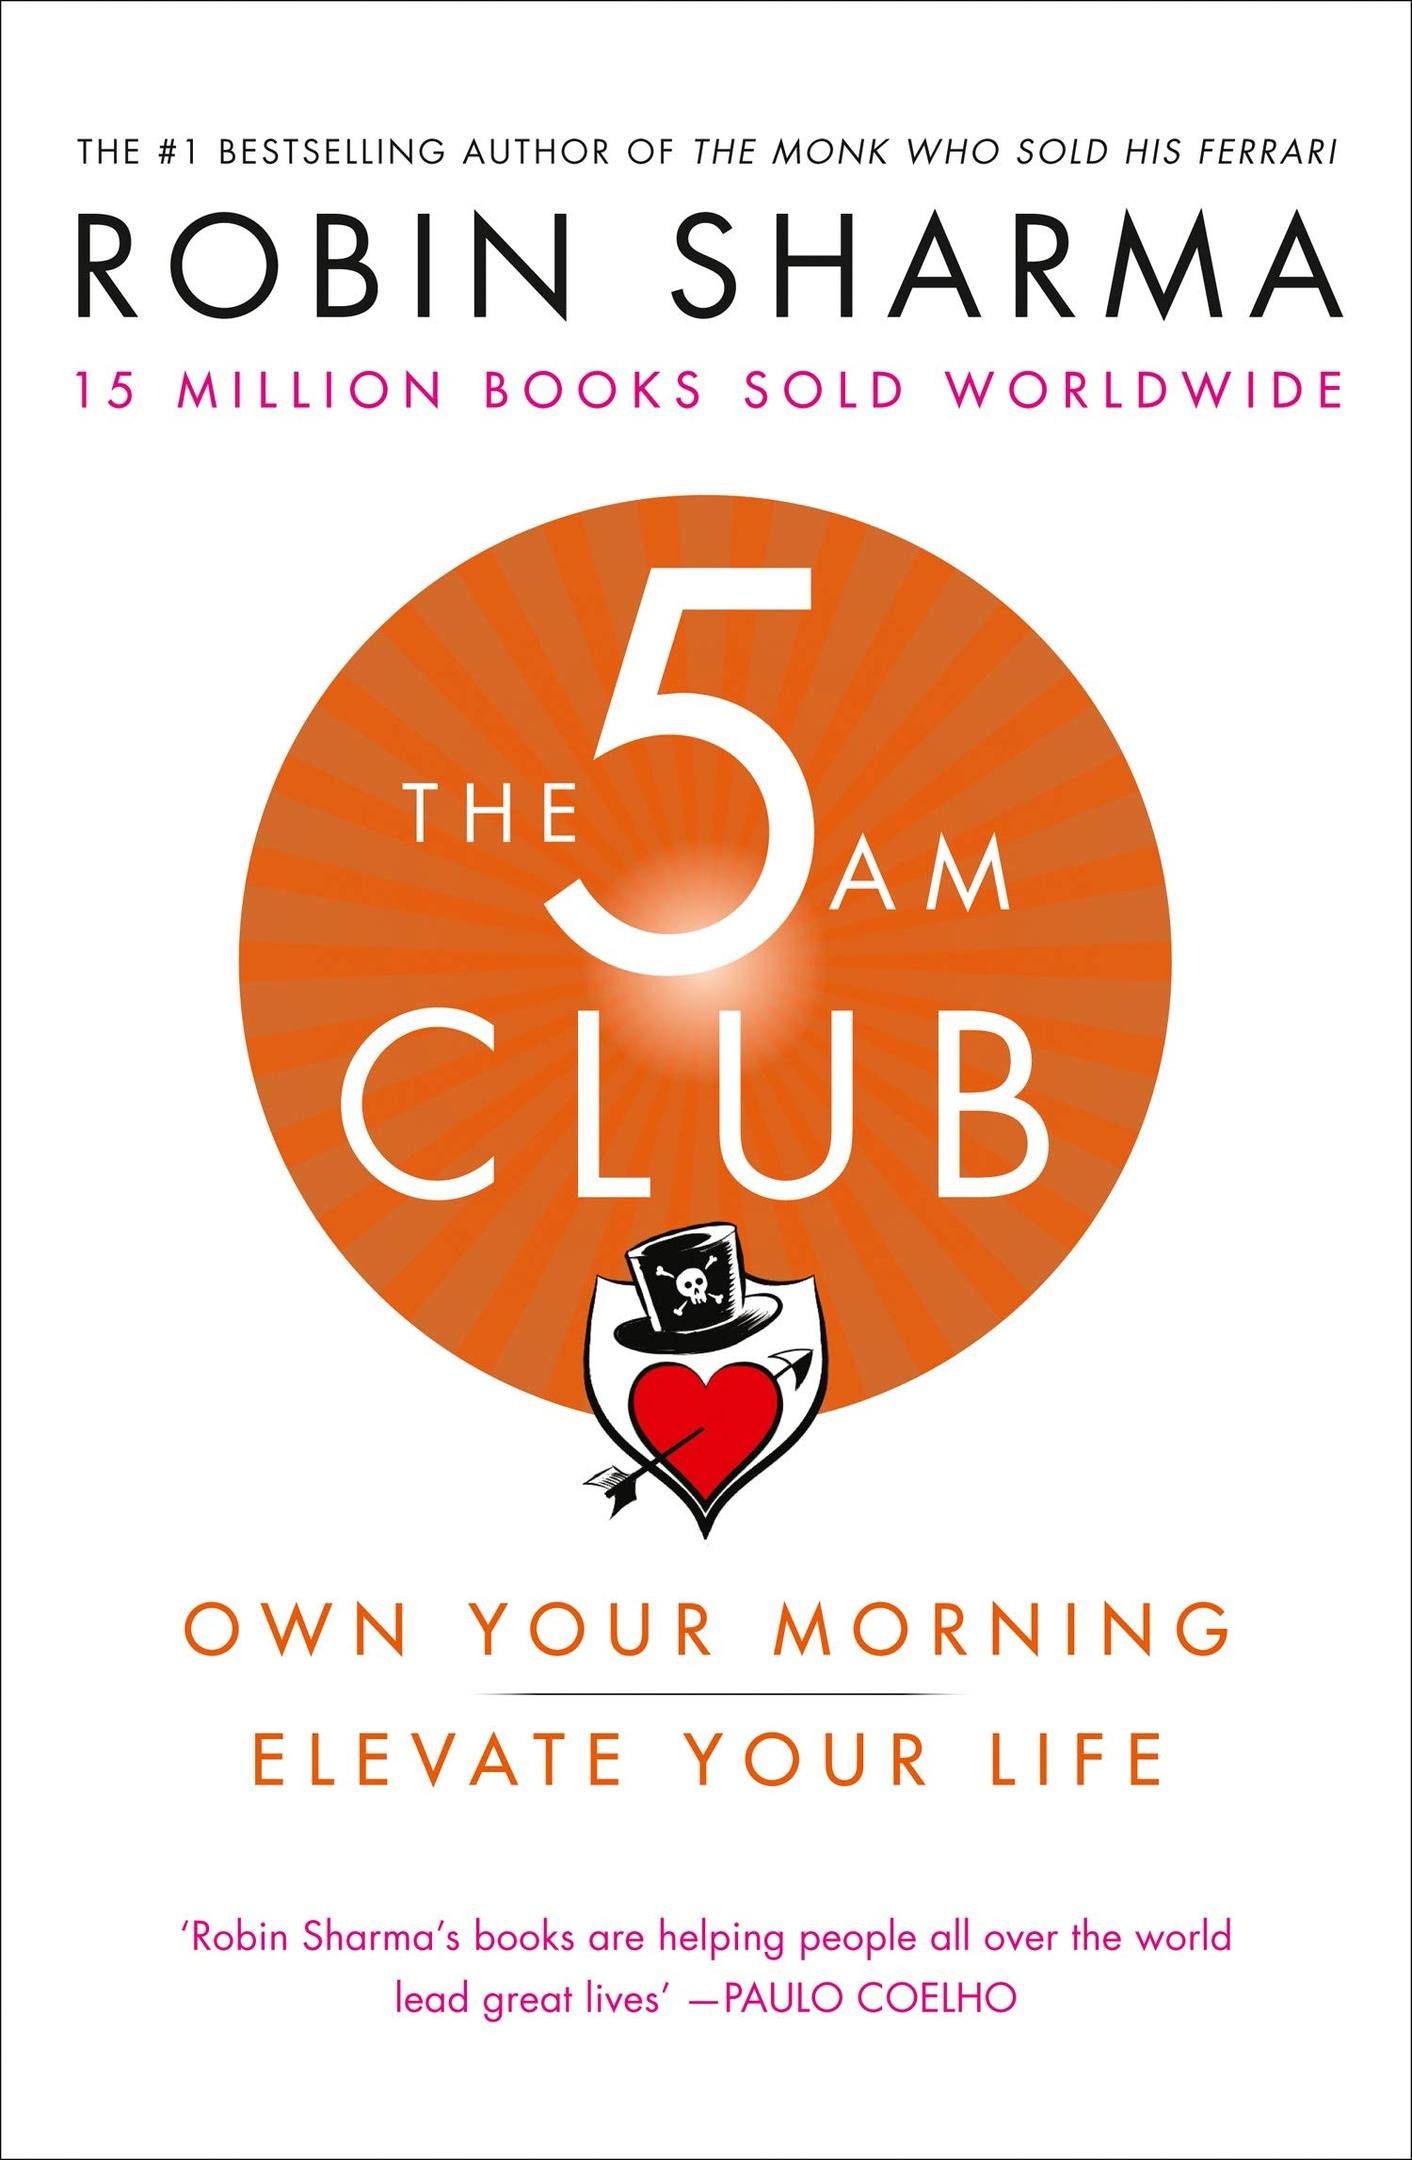 Robin Sharma – The 5 AM Club